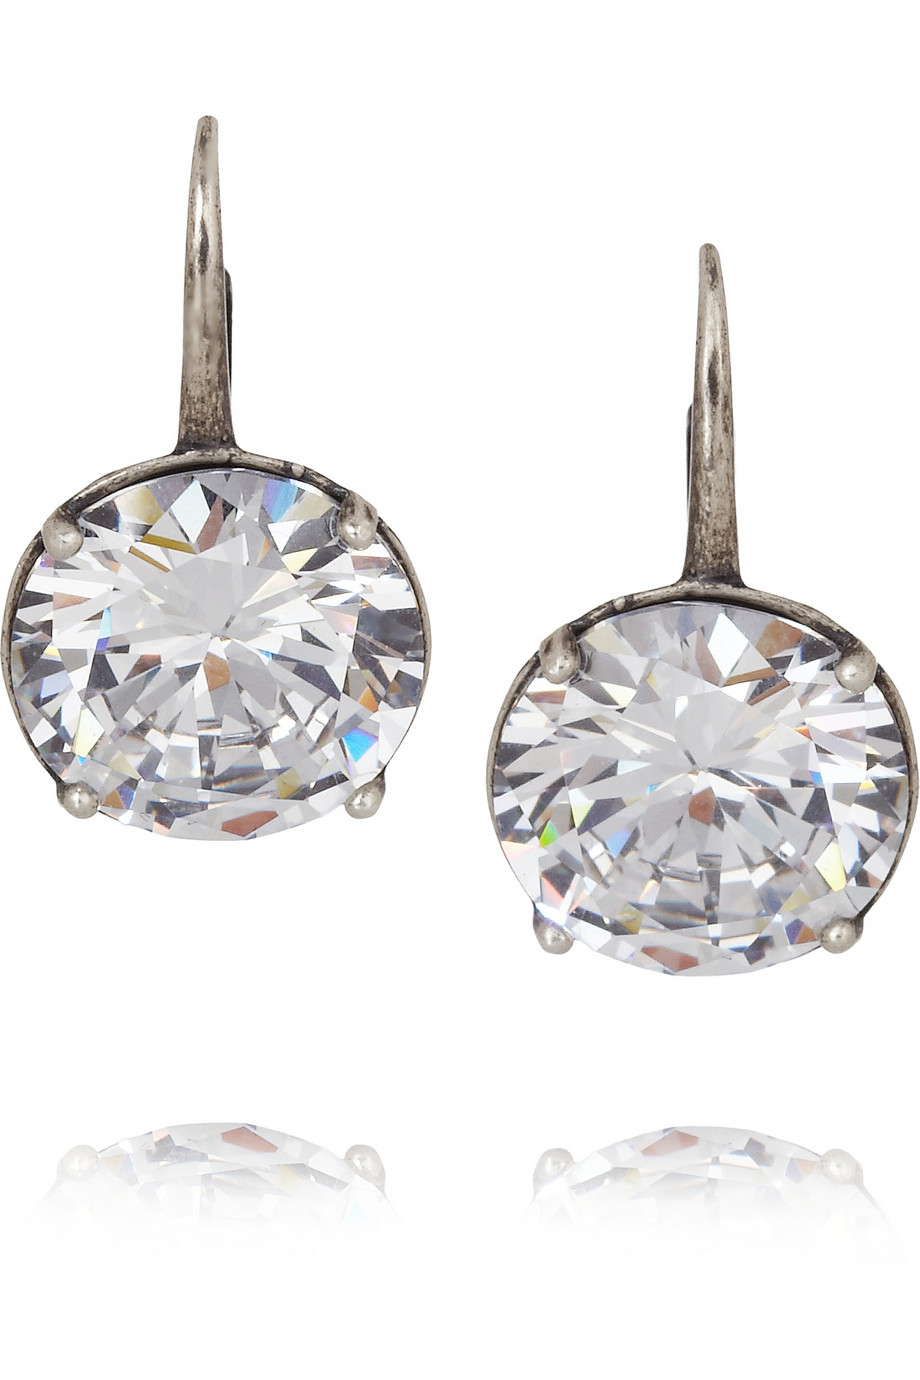 Bottega Veneta Sterling silver earrings with cubic zirconia 6jrBGLSt4